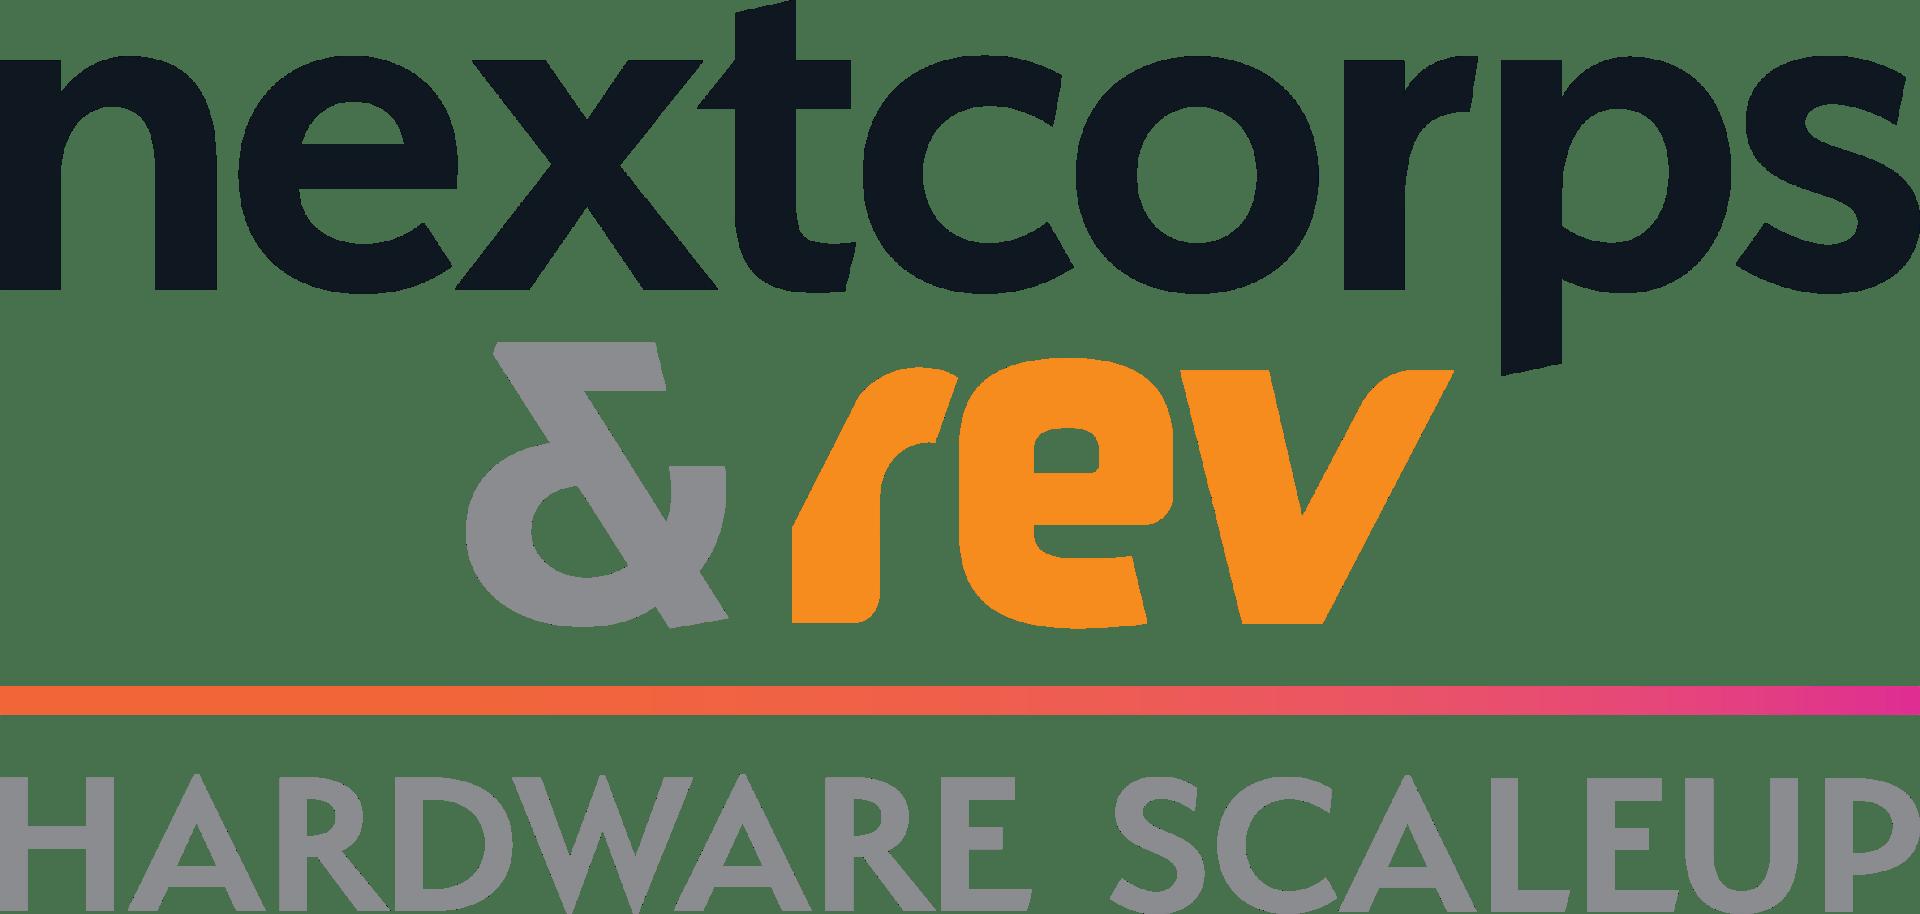 Nextcorps and Rev Hardware Scaleup